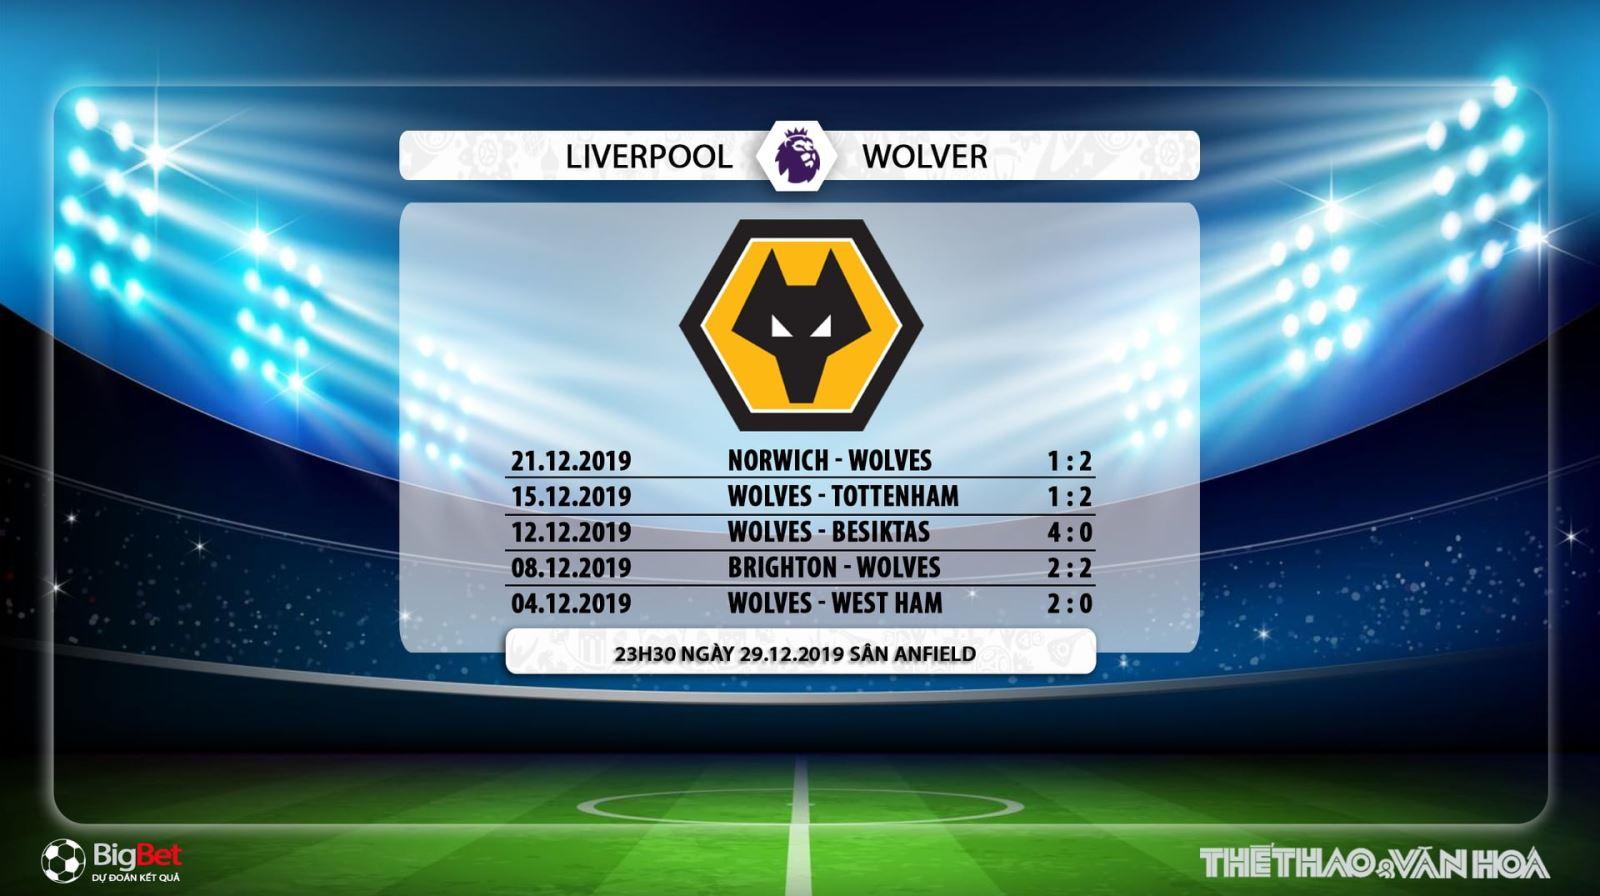 Liverpool vs Wolves, trực tiếp Liverpool vs Wolves, bóng đá, bong da, liverpool, wolves, soi kèo Liverpool vs Wolves, K+, K+PM